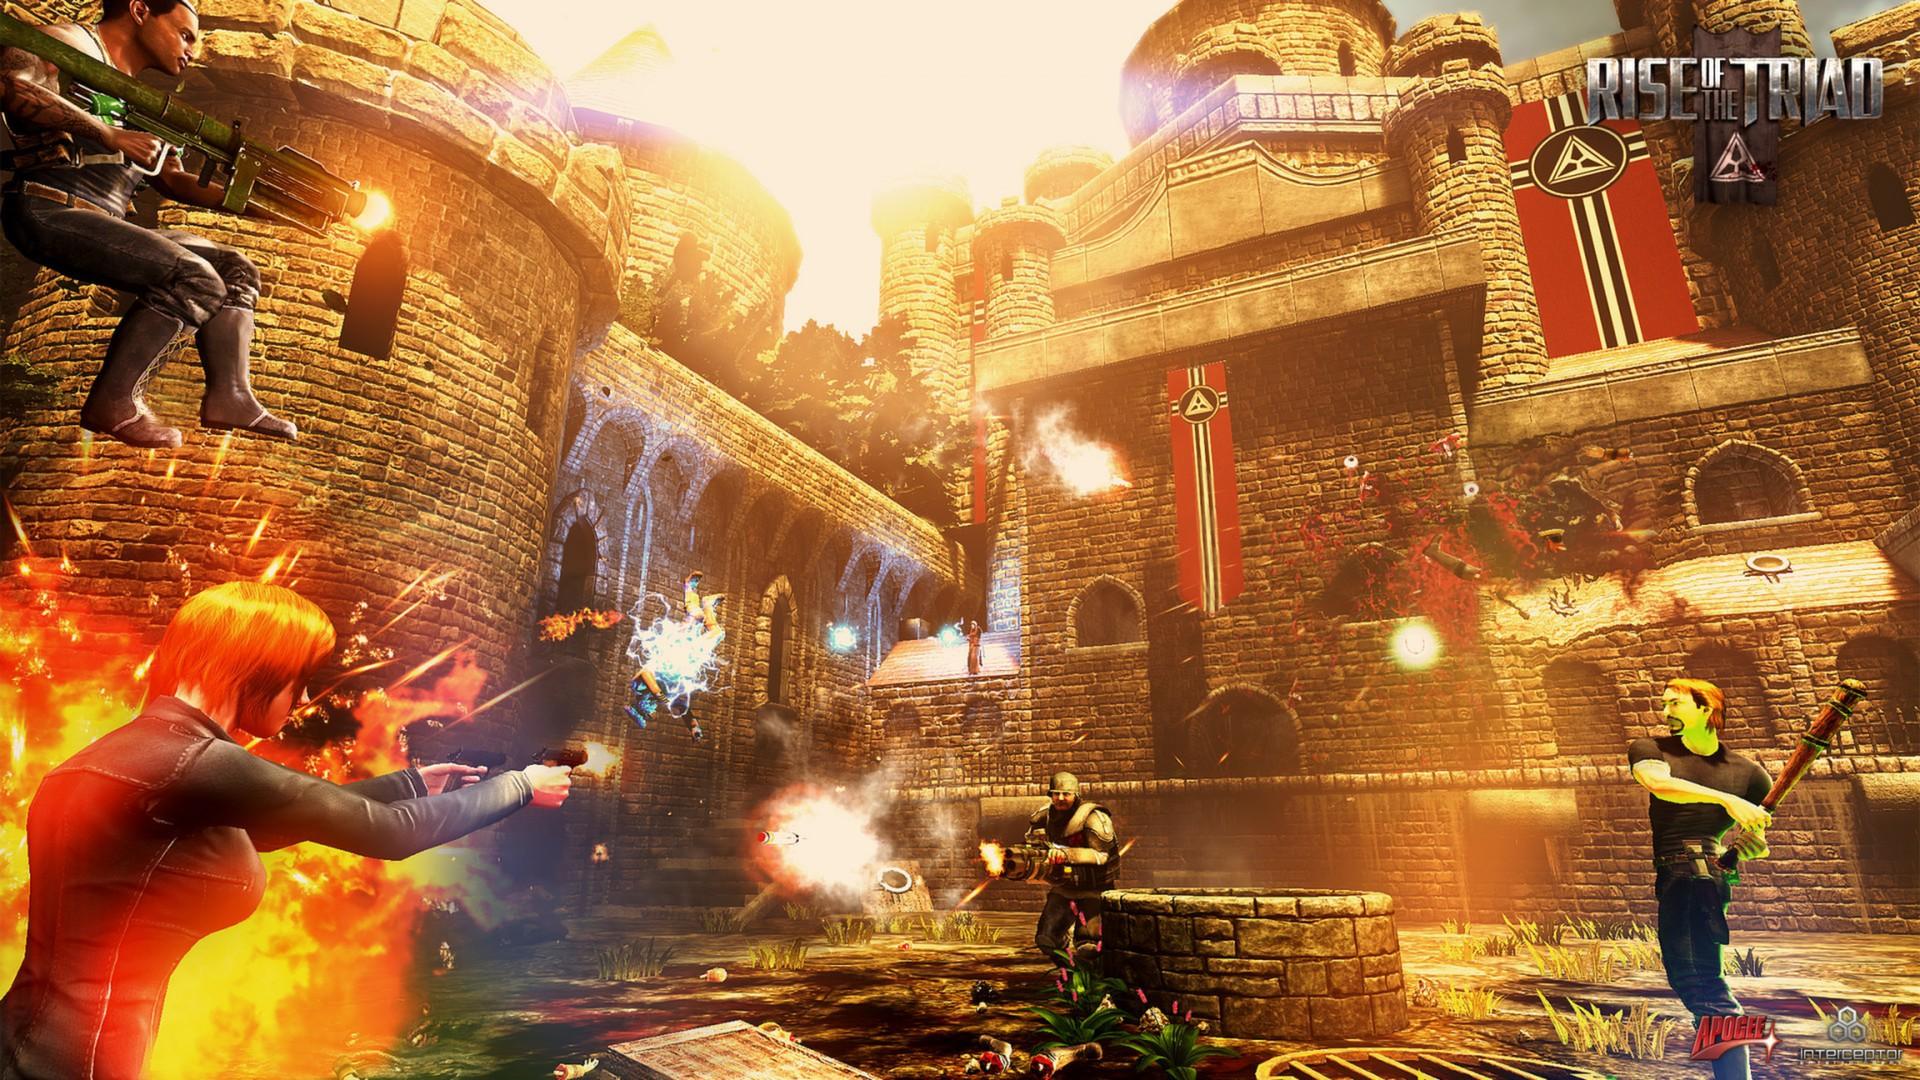 Rise of the Triad (2013) screenshot 2